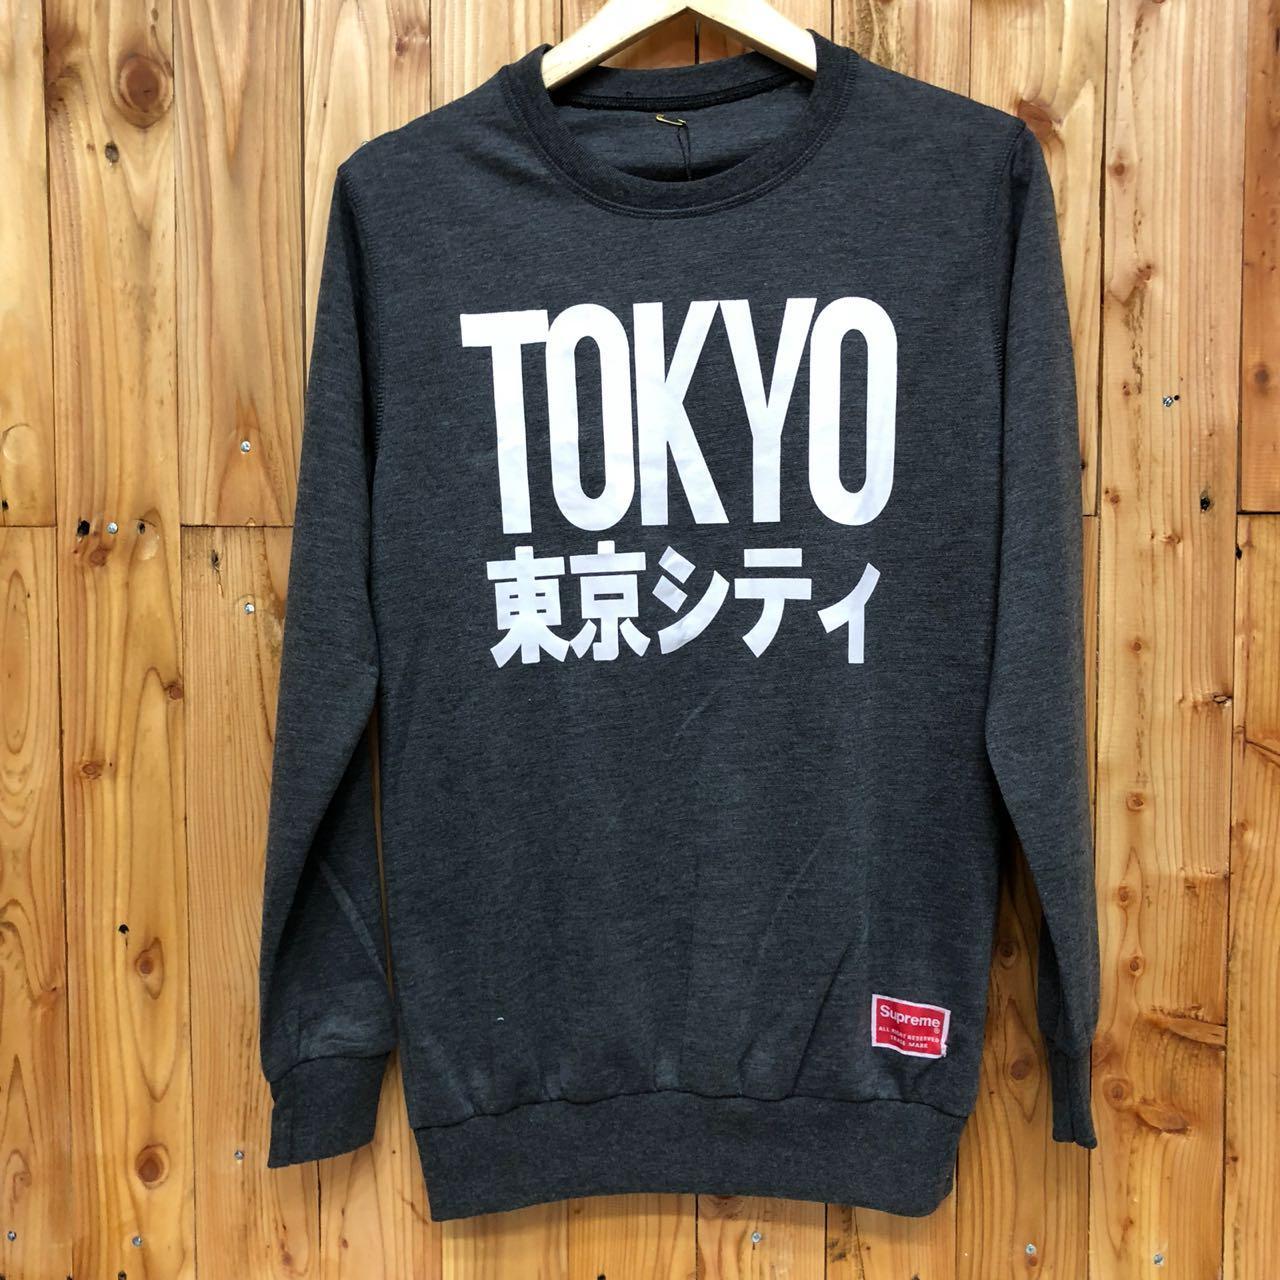 Features Nia Fashion Sweater Sweatshirt Basic Oblong Supreme Lengan Polos Hitam Panjang Pria Cowok Distro Ala